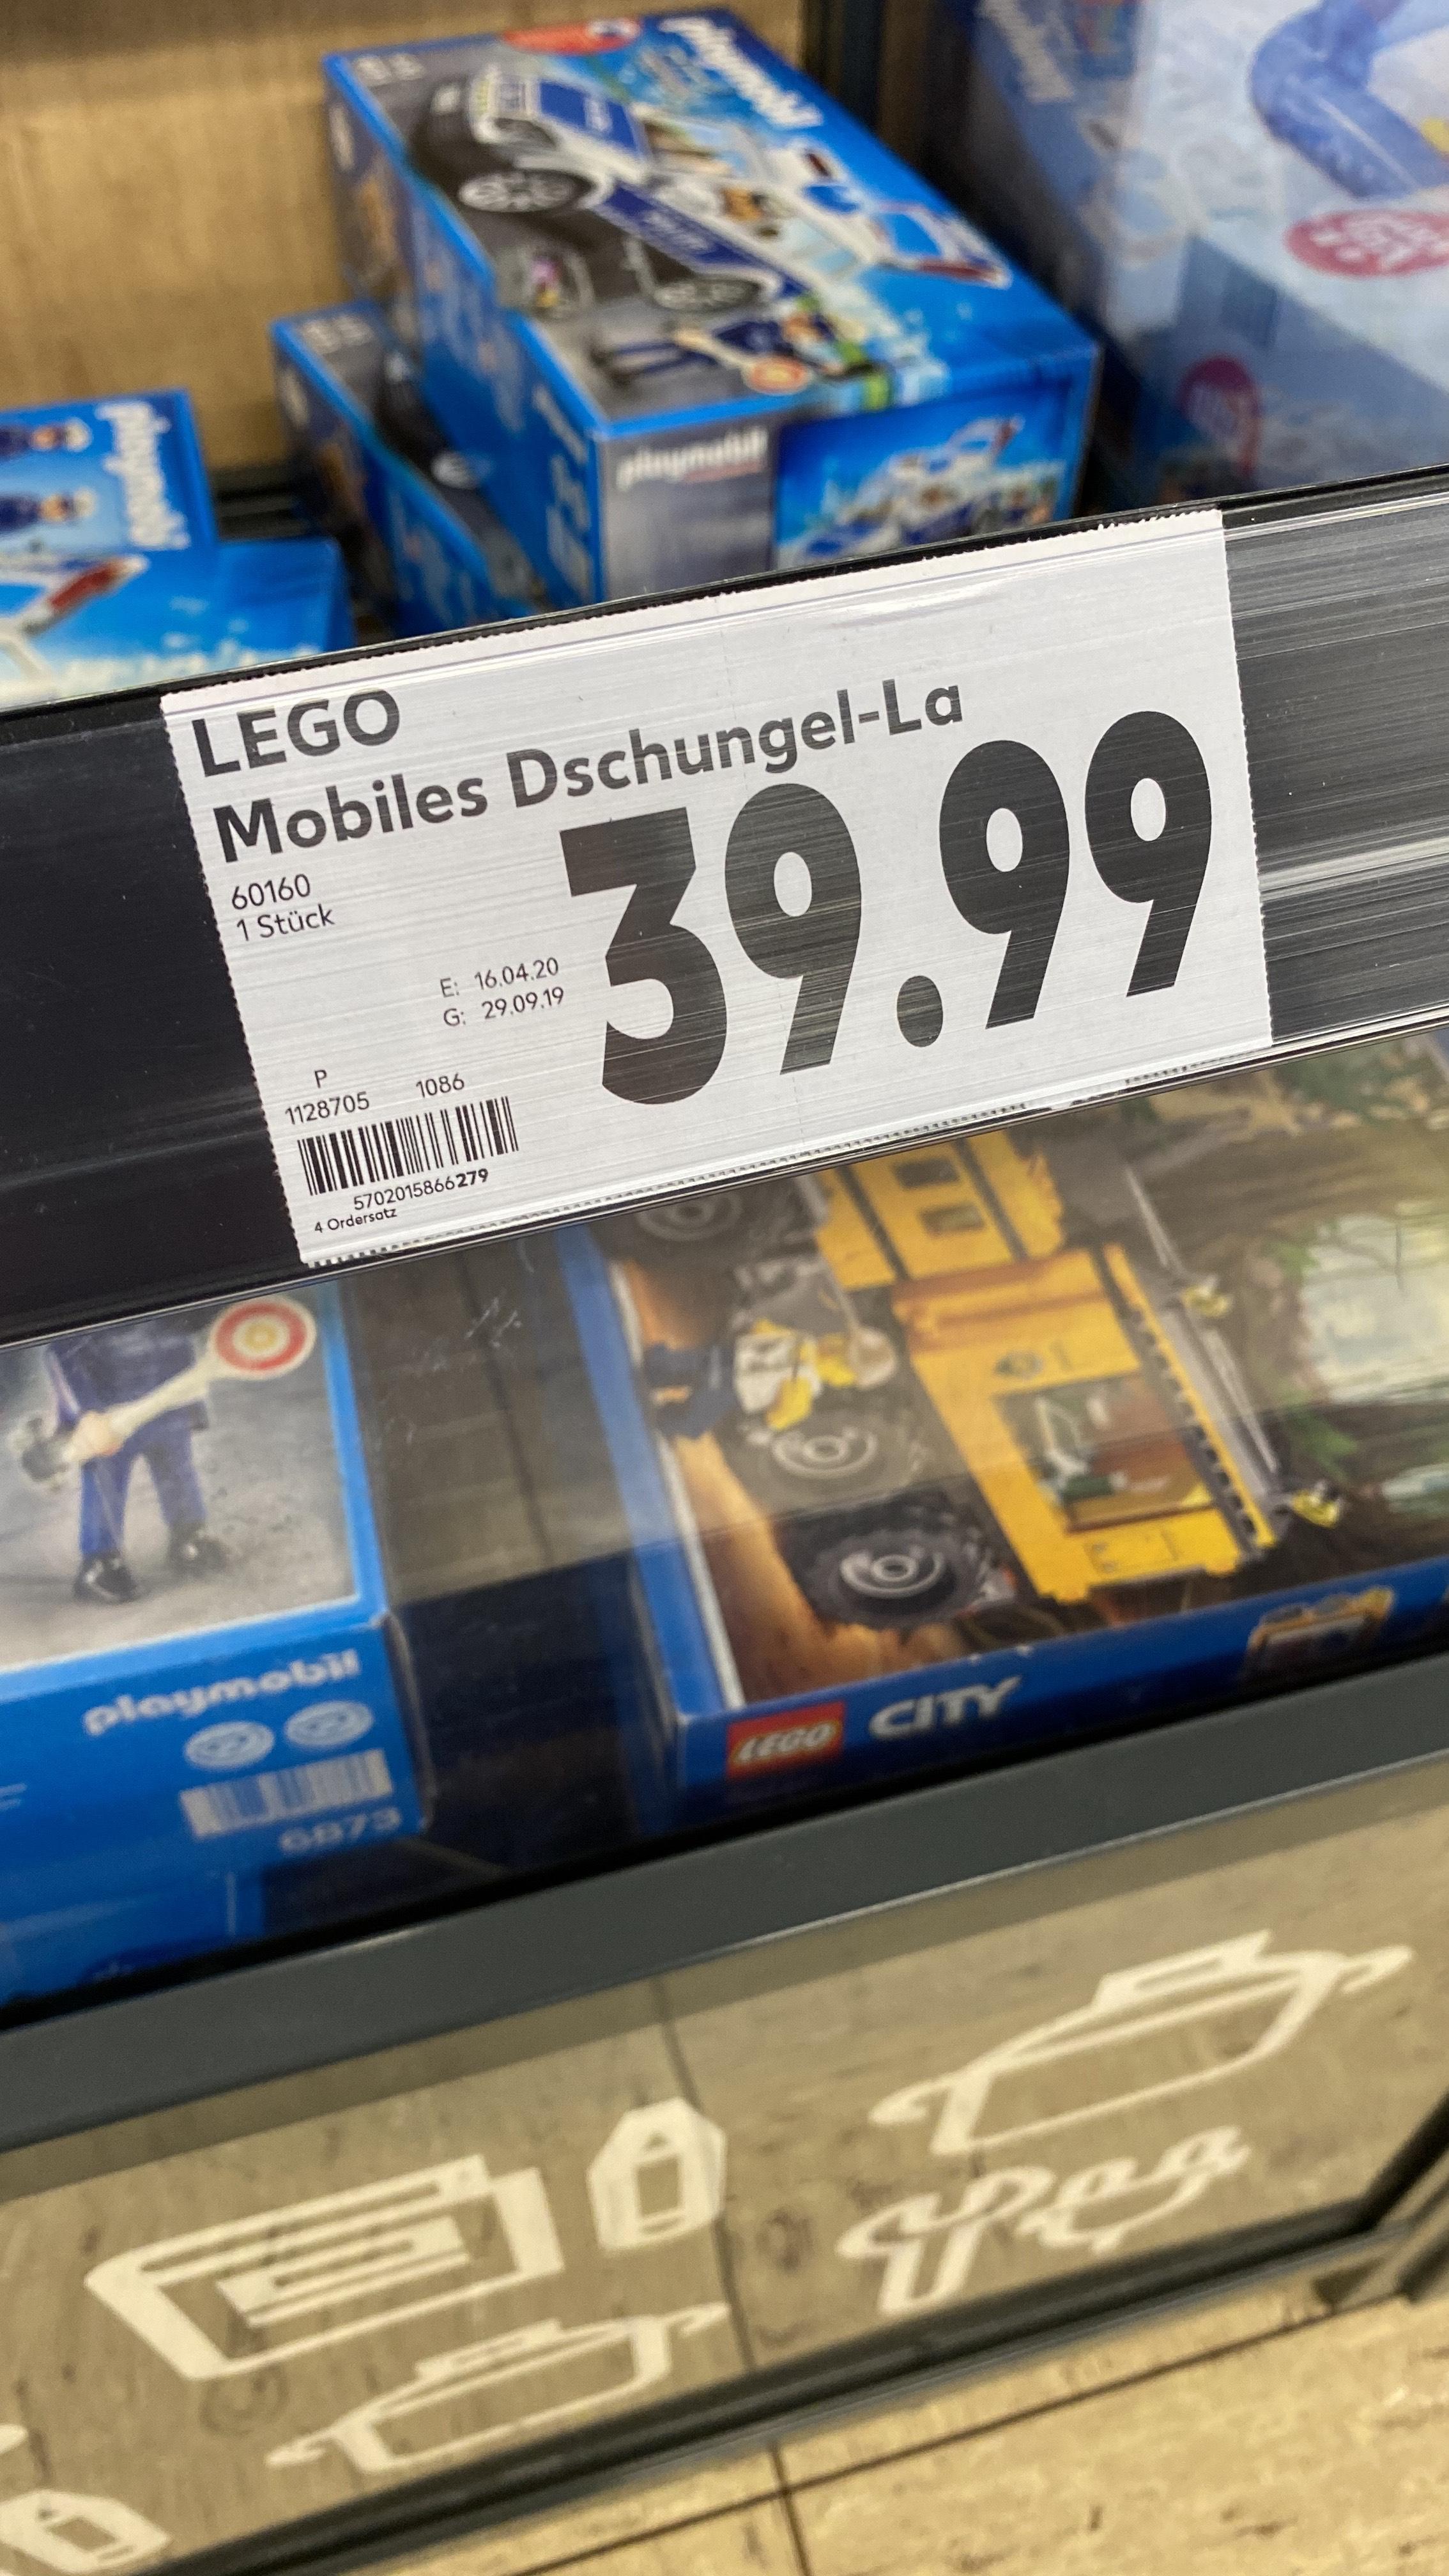 Lokal   Lego City - Mobiles Dschungel-Labor (60160)